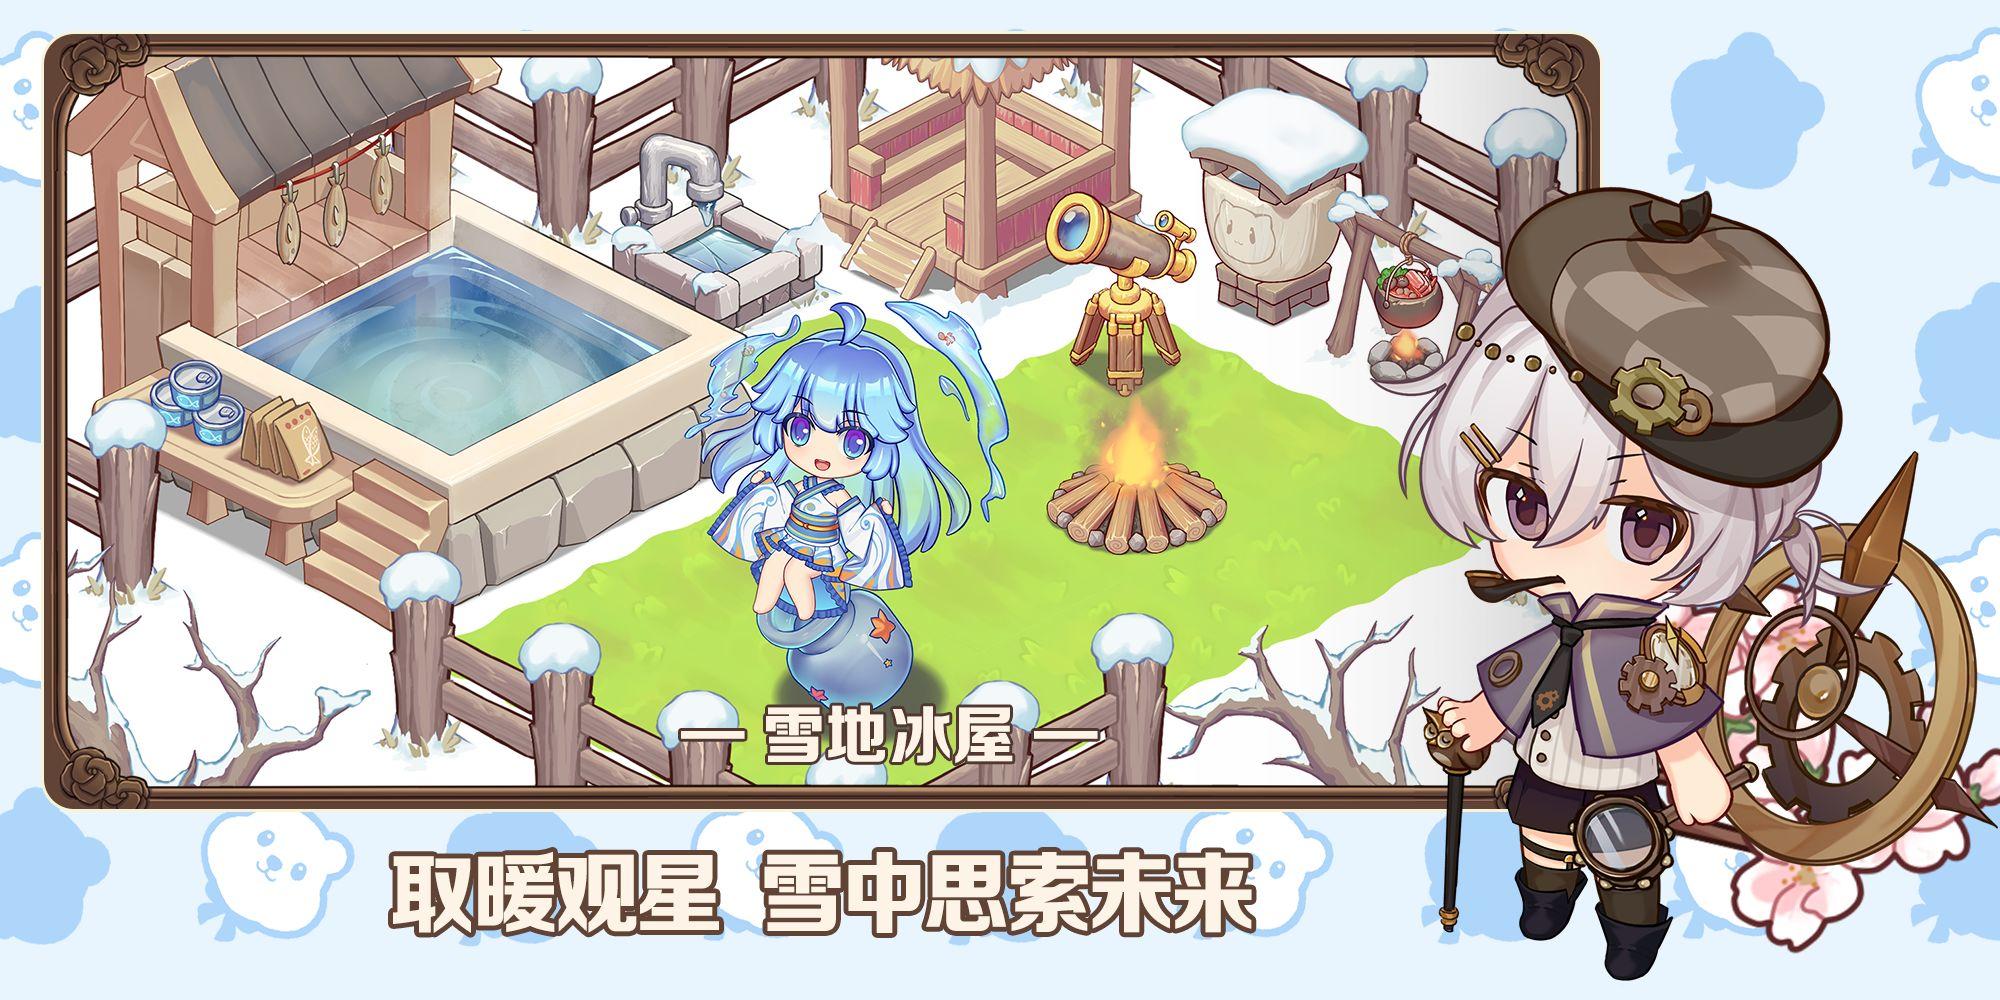 http://www.youxixj.com/youxizhanhui/418290.html